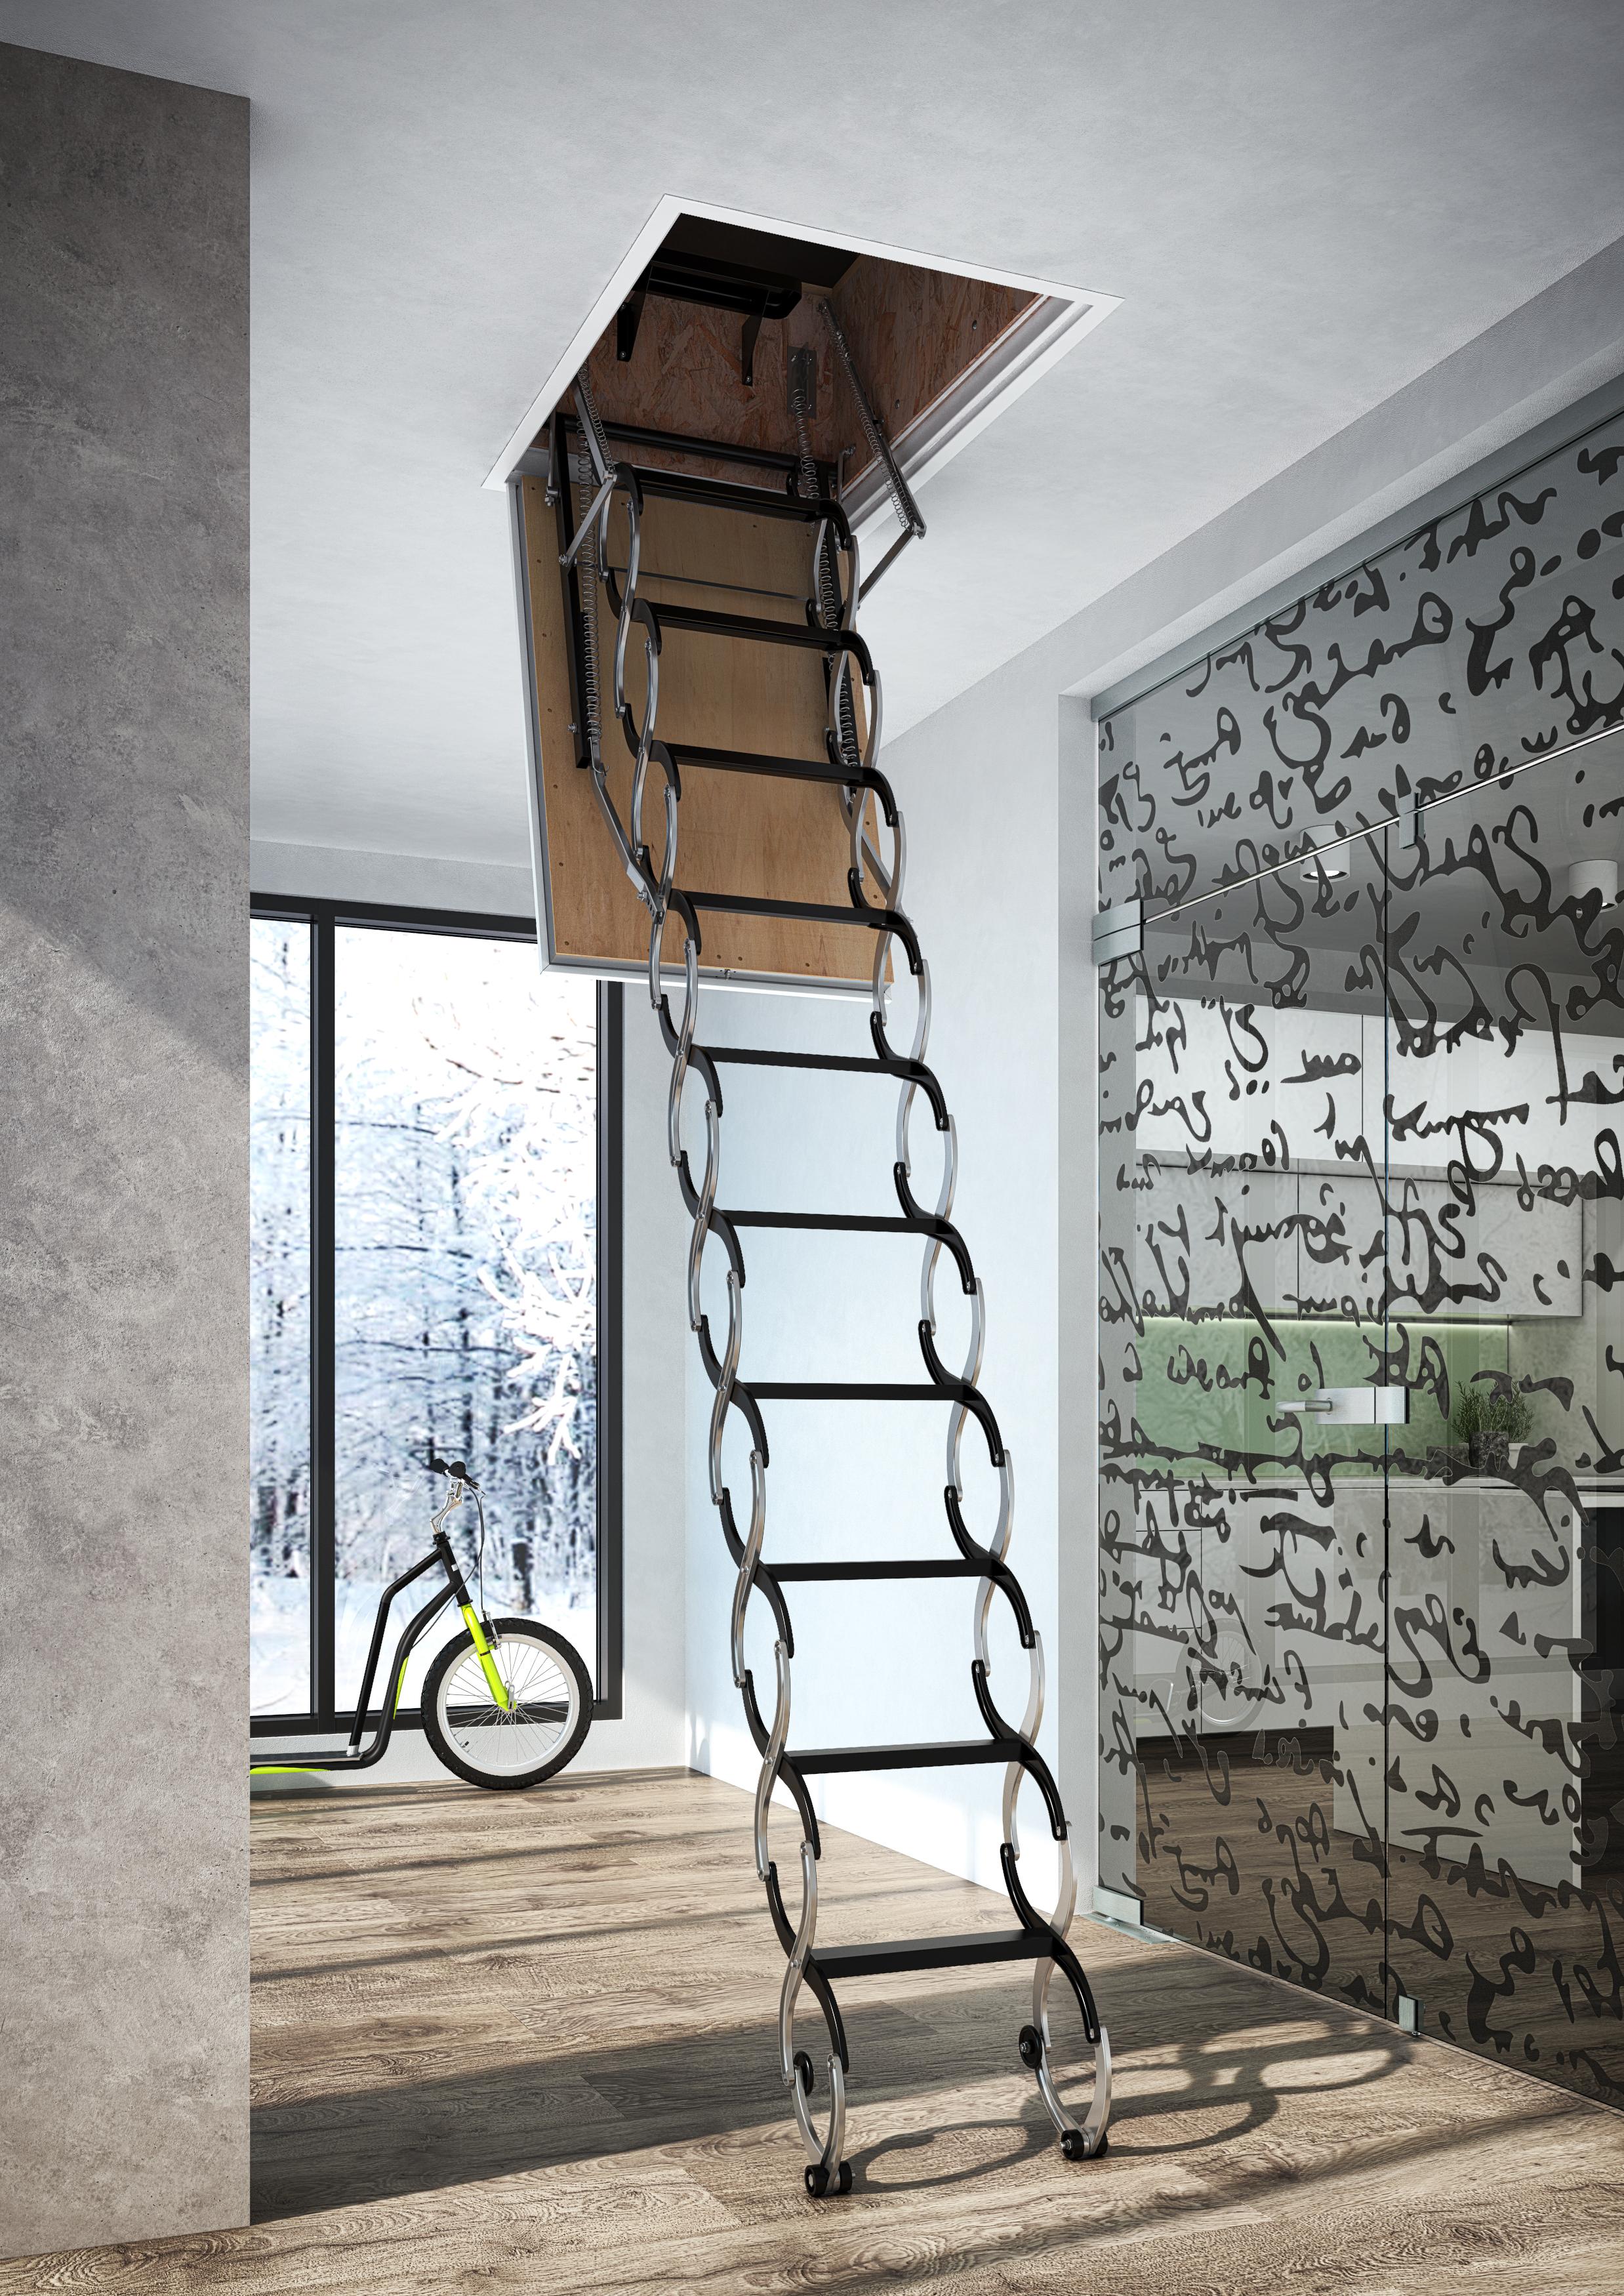 Pudni stahovaci schody KOMBO foto zdroj JAP FUTURE 2